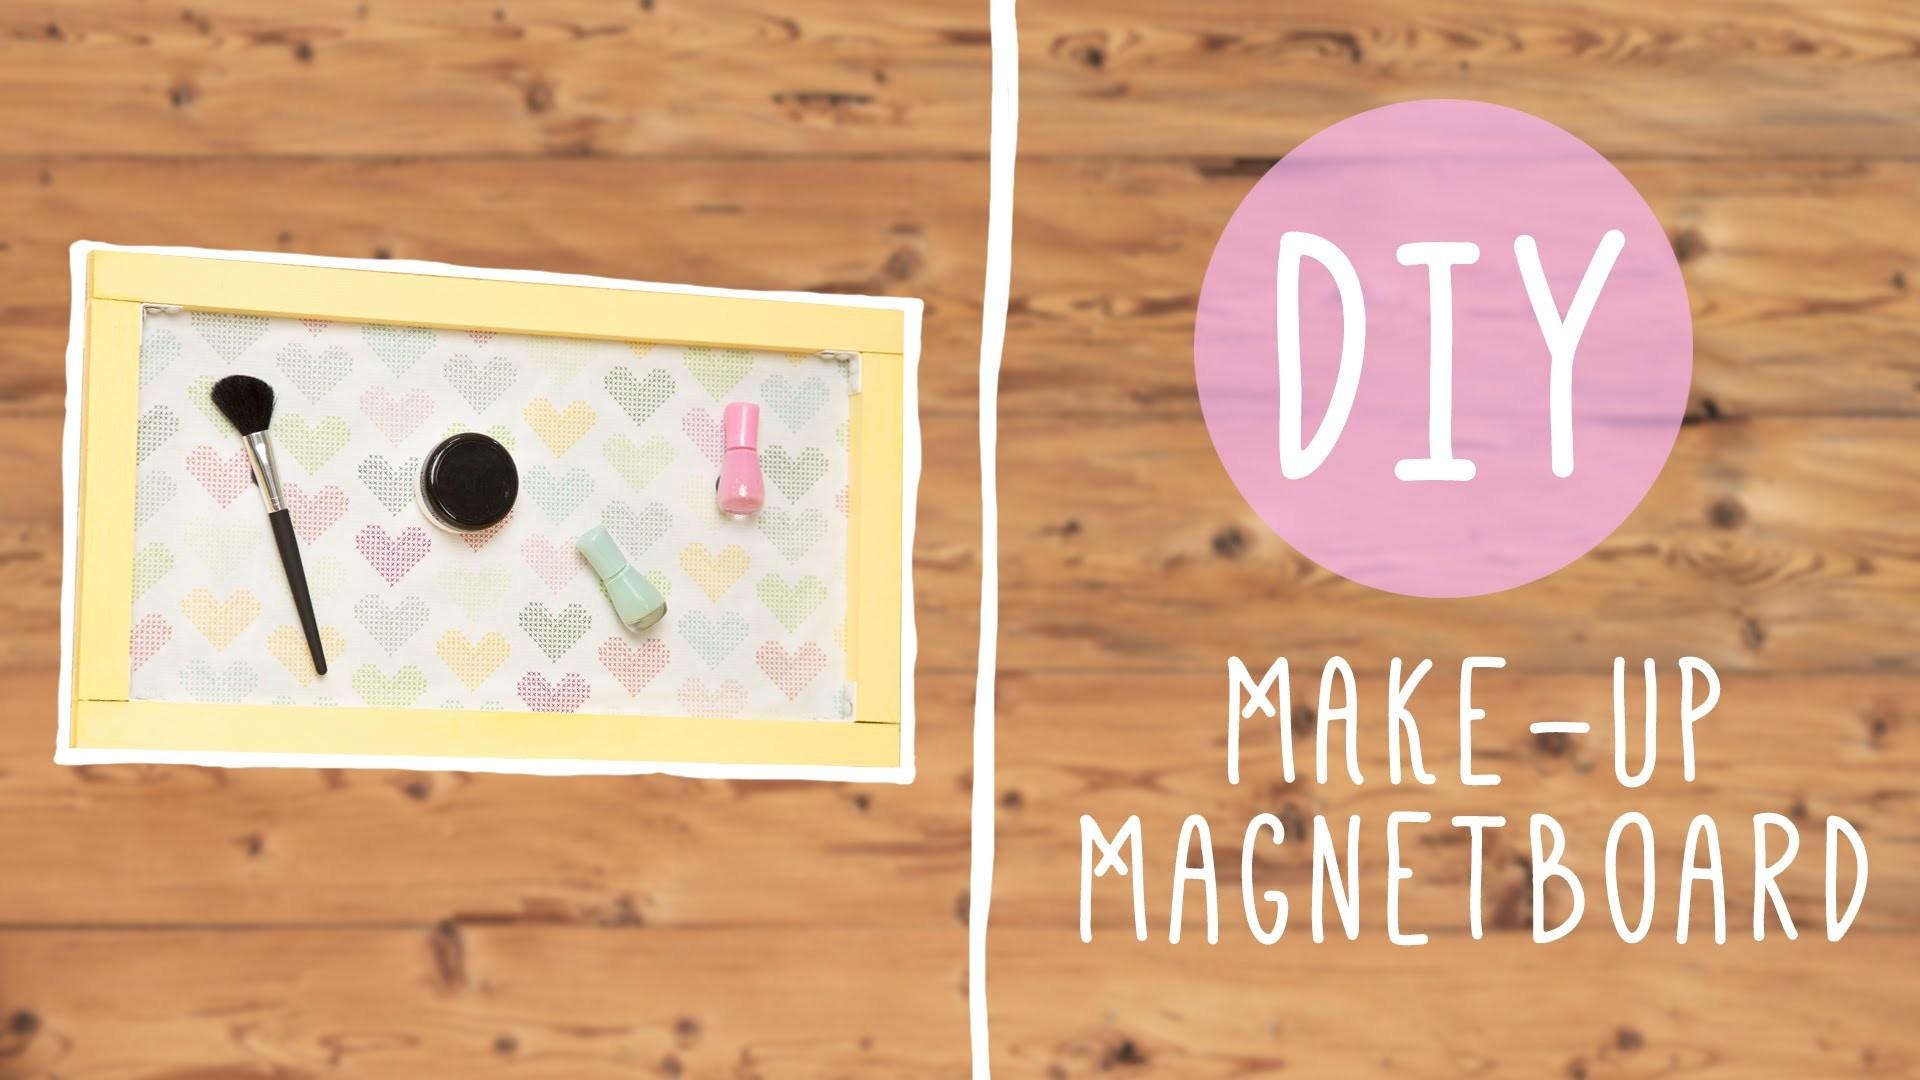 DIY mit Nina Moghaddam: Make-up Magnetboard selbstgemacht ♡ ♡ ♡